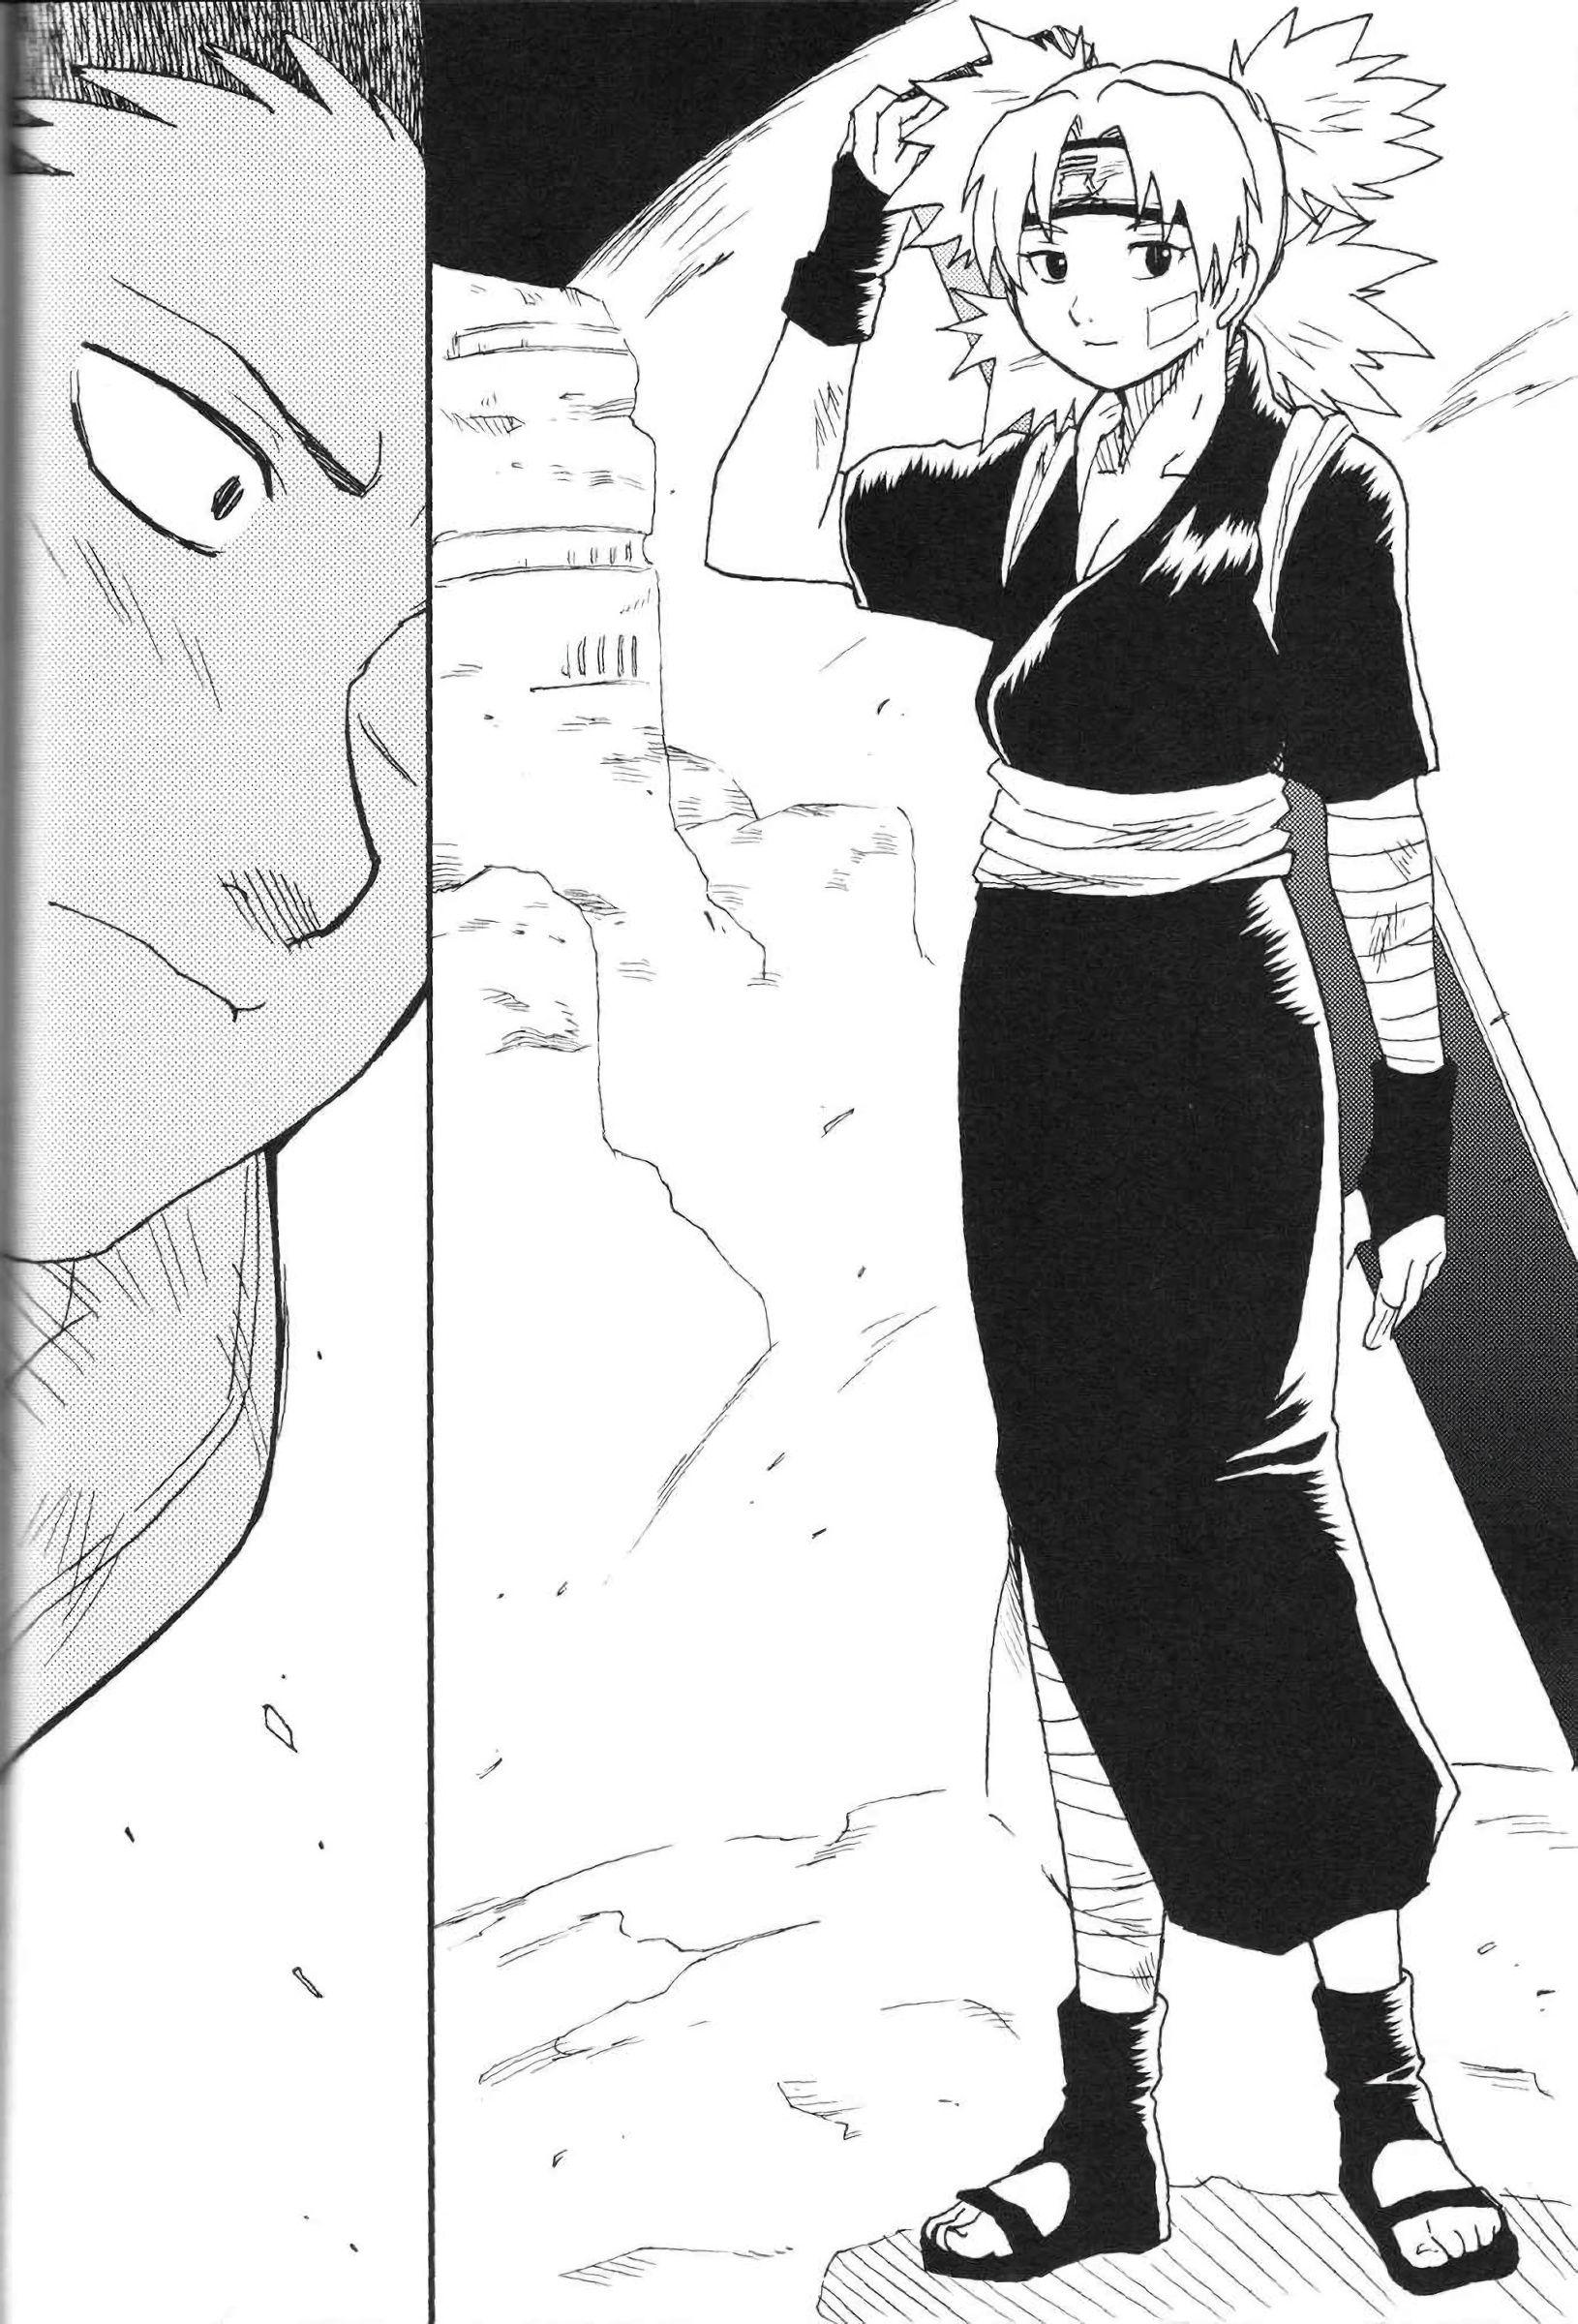 Temarito hentai manga picture 25